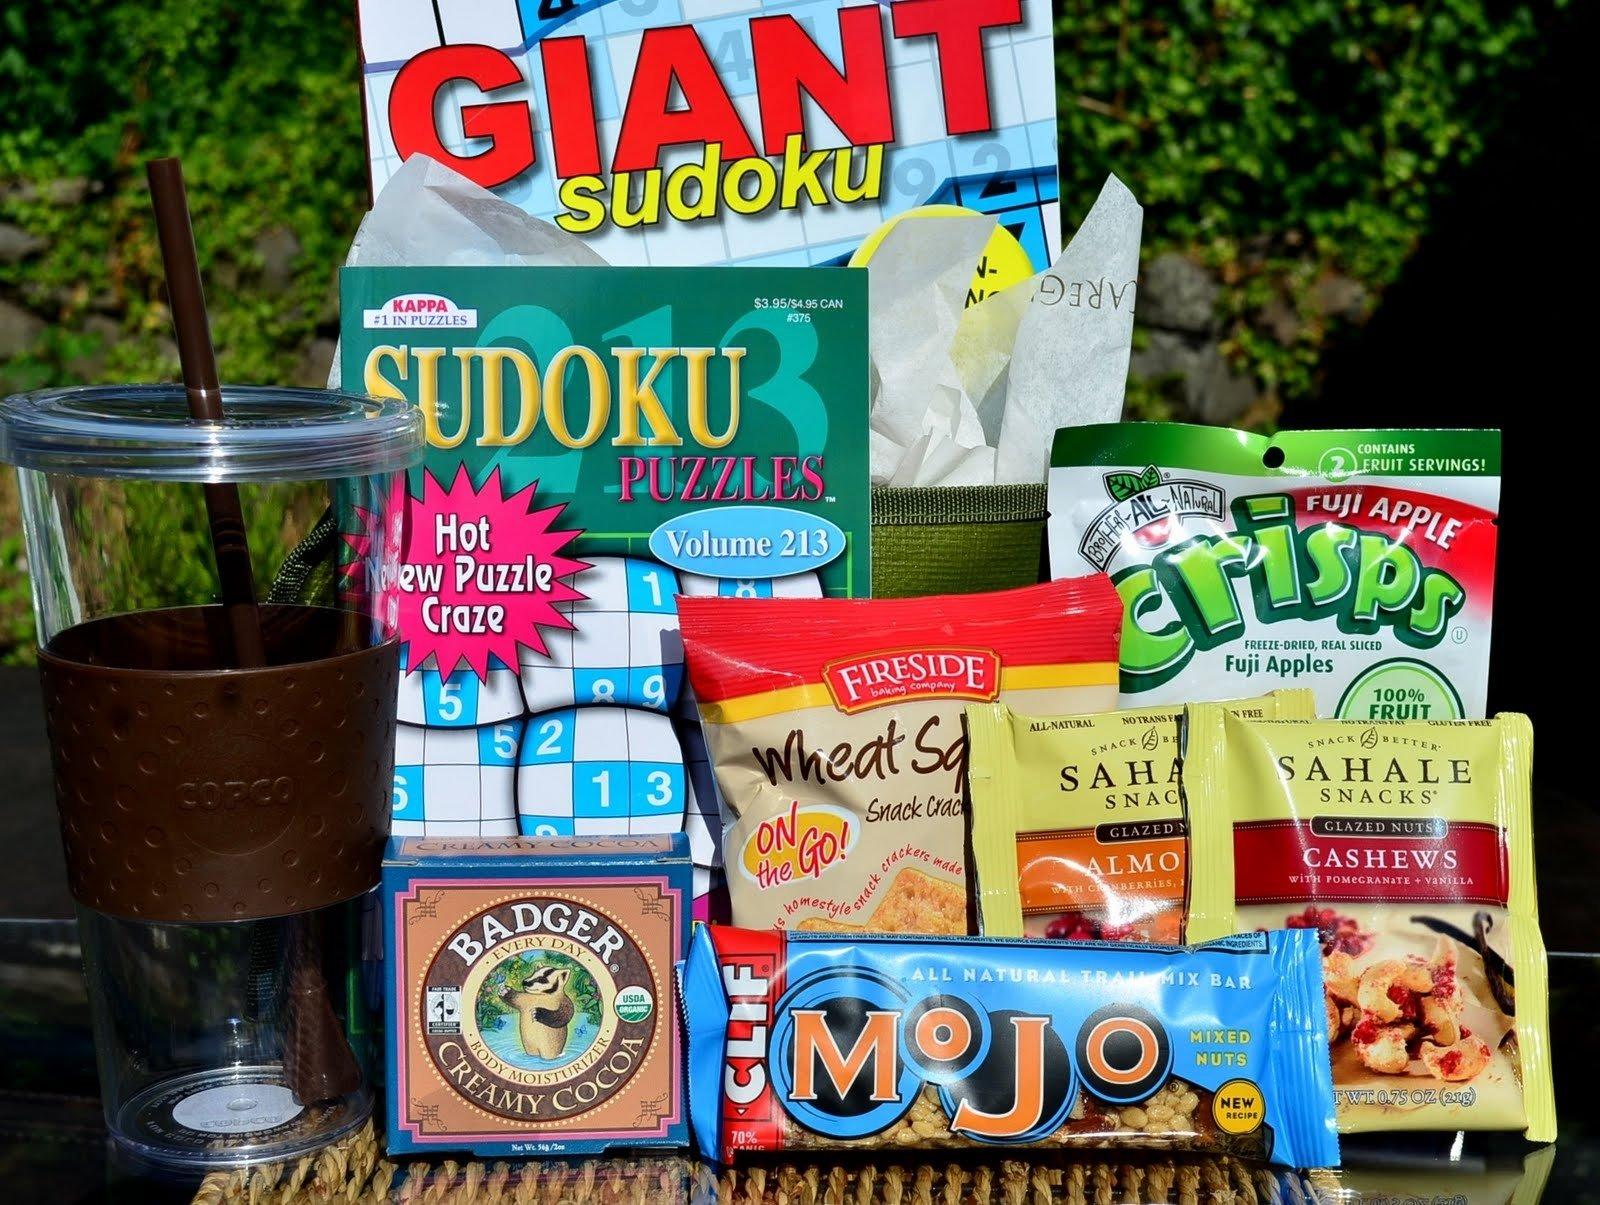 10 Elegant Food Gift Ideas For Men sudoku and snacks gift for men get well gifts for men pinterest 2 2020